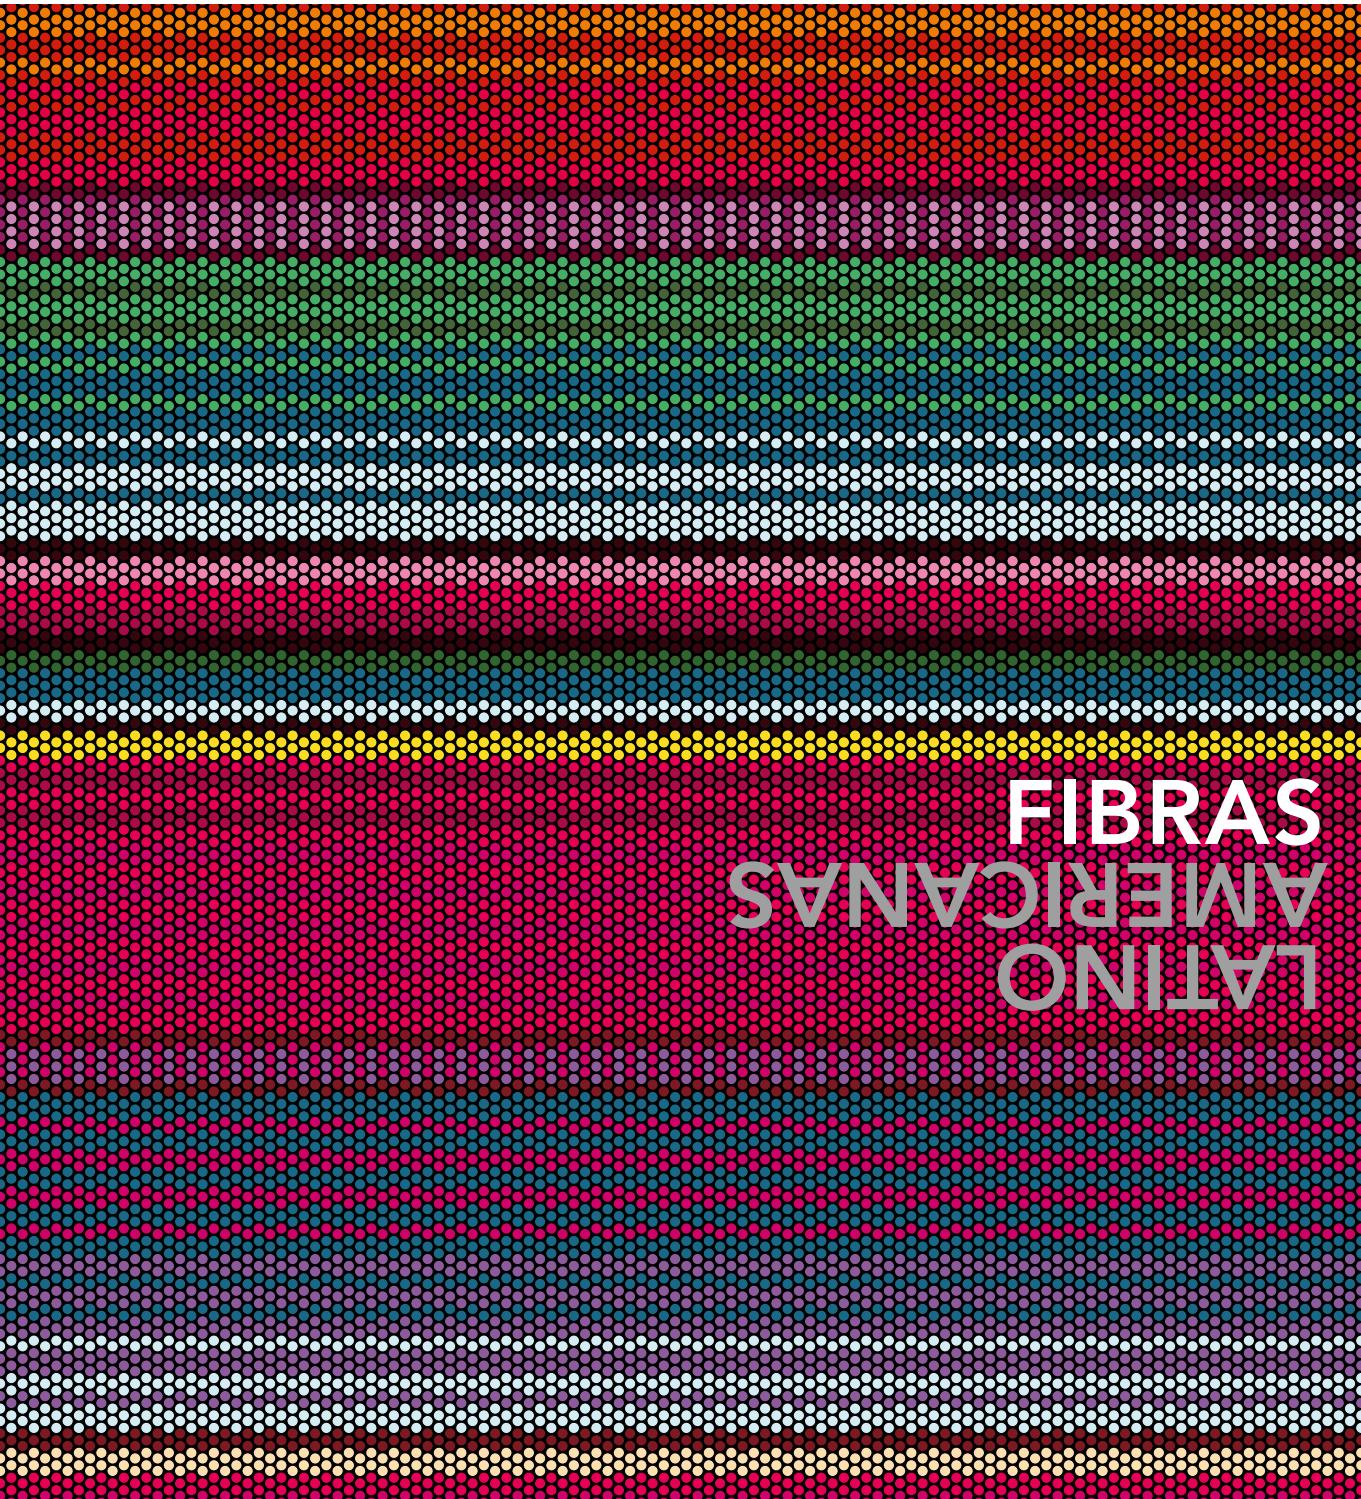 Fibras latinoamericanas by arte al lmite issuu malvernweather Choice Image